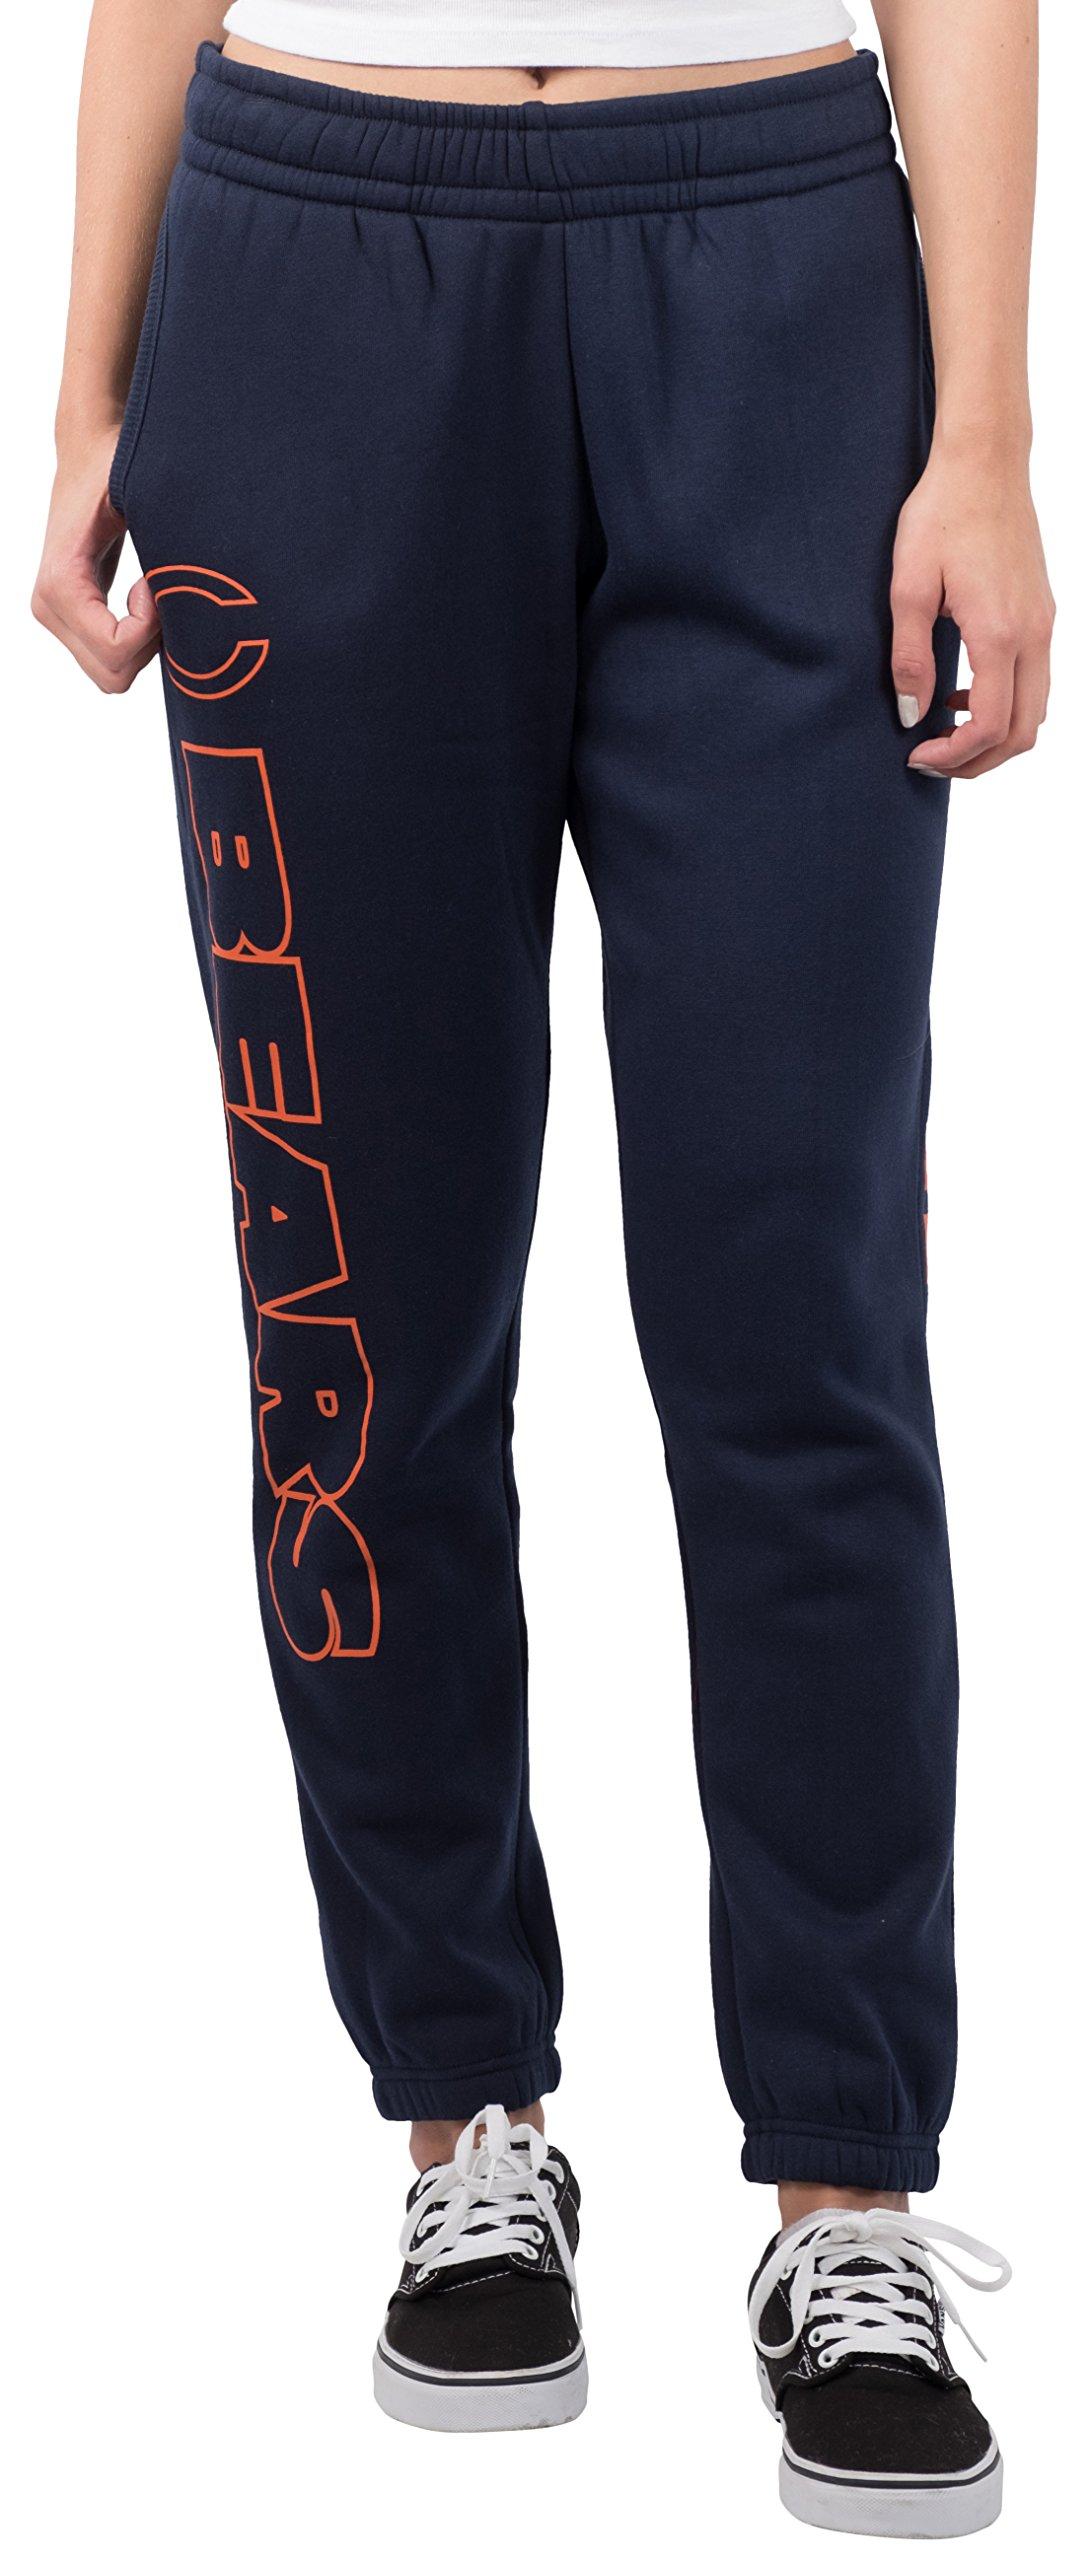 Ultra Game NFL Chicago Bears Women's Relax Fit Fleece Jogger Sweatpants, Medium, Navy